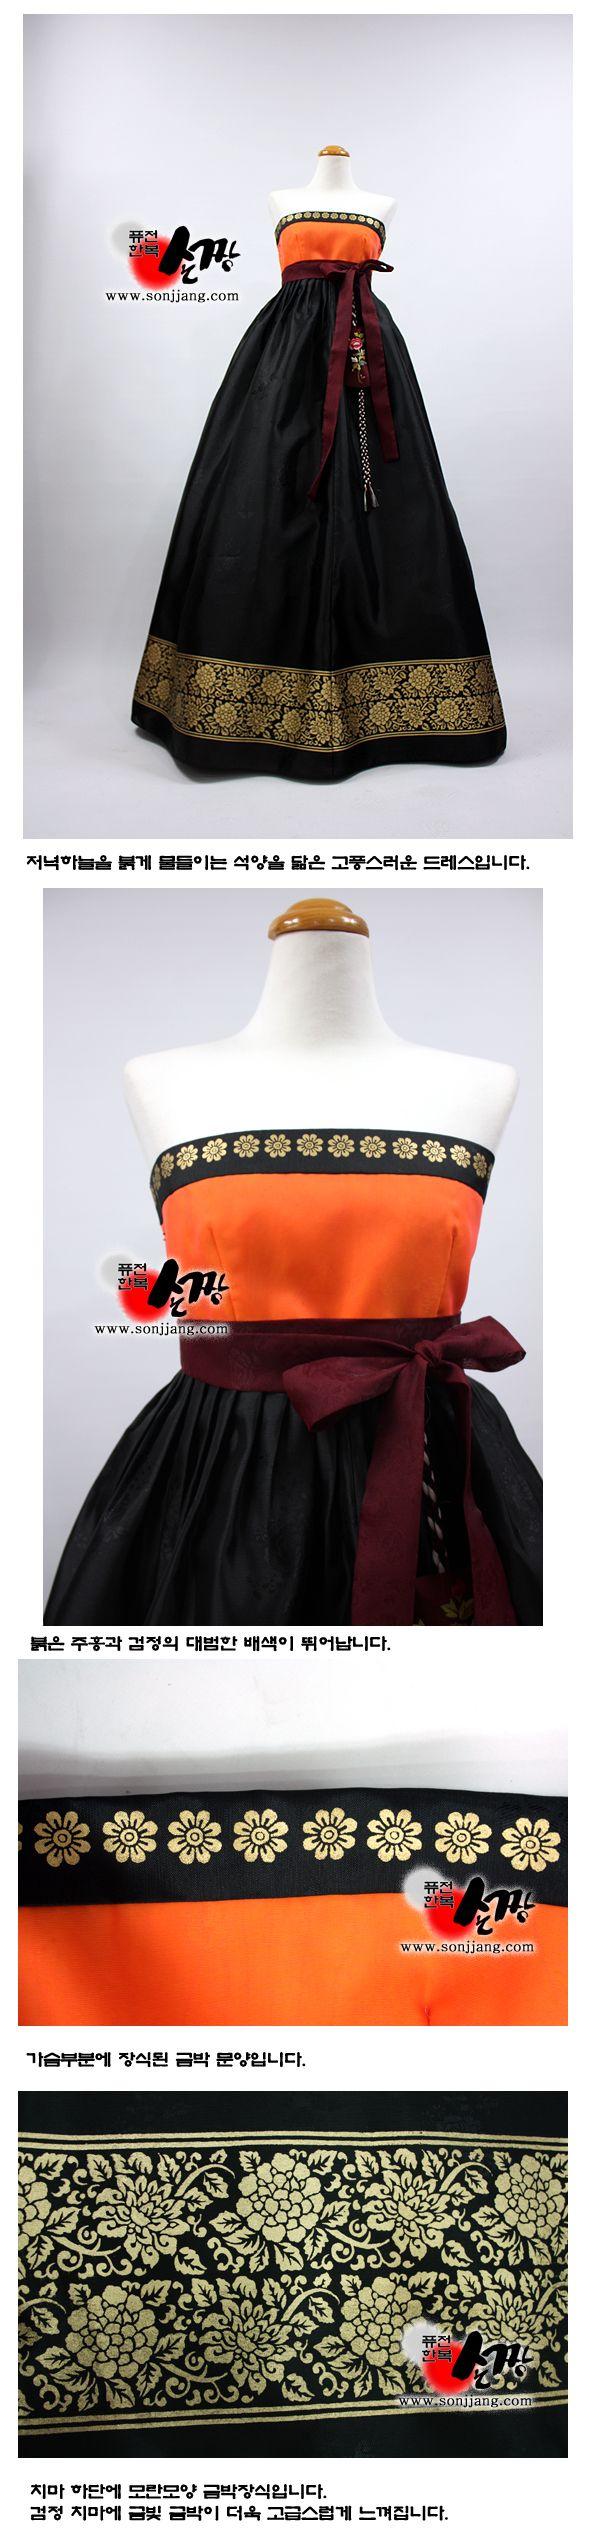 Most likely my next Hanbok  ^^¥ HANBOK - korean clothes,traditional dress,modern hanbok,korean prom dresses,korean wedding dresses